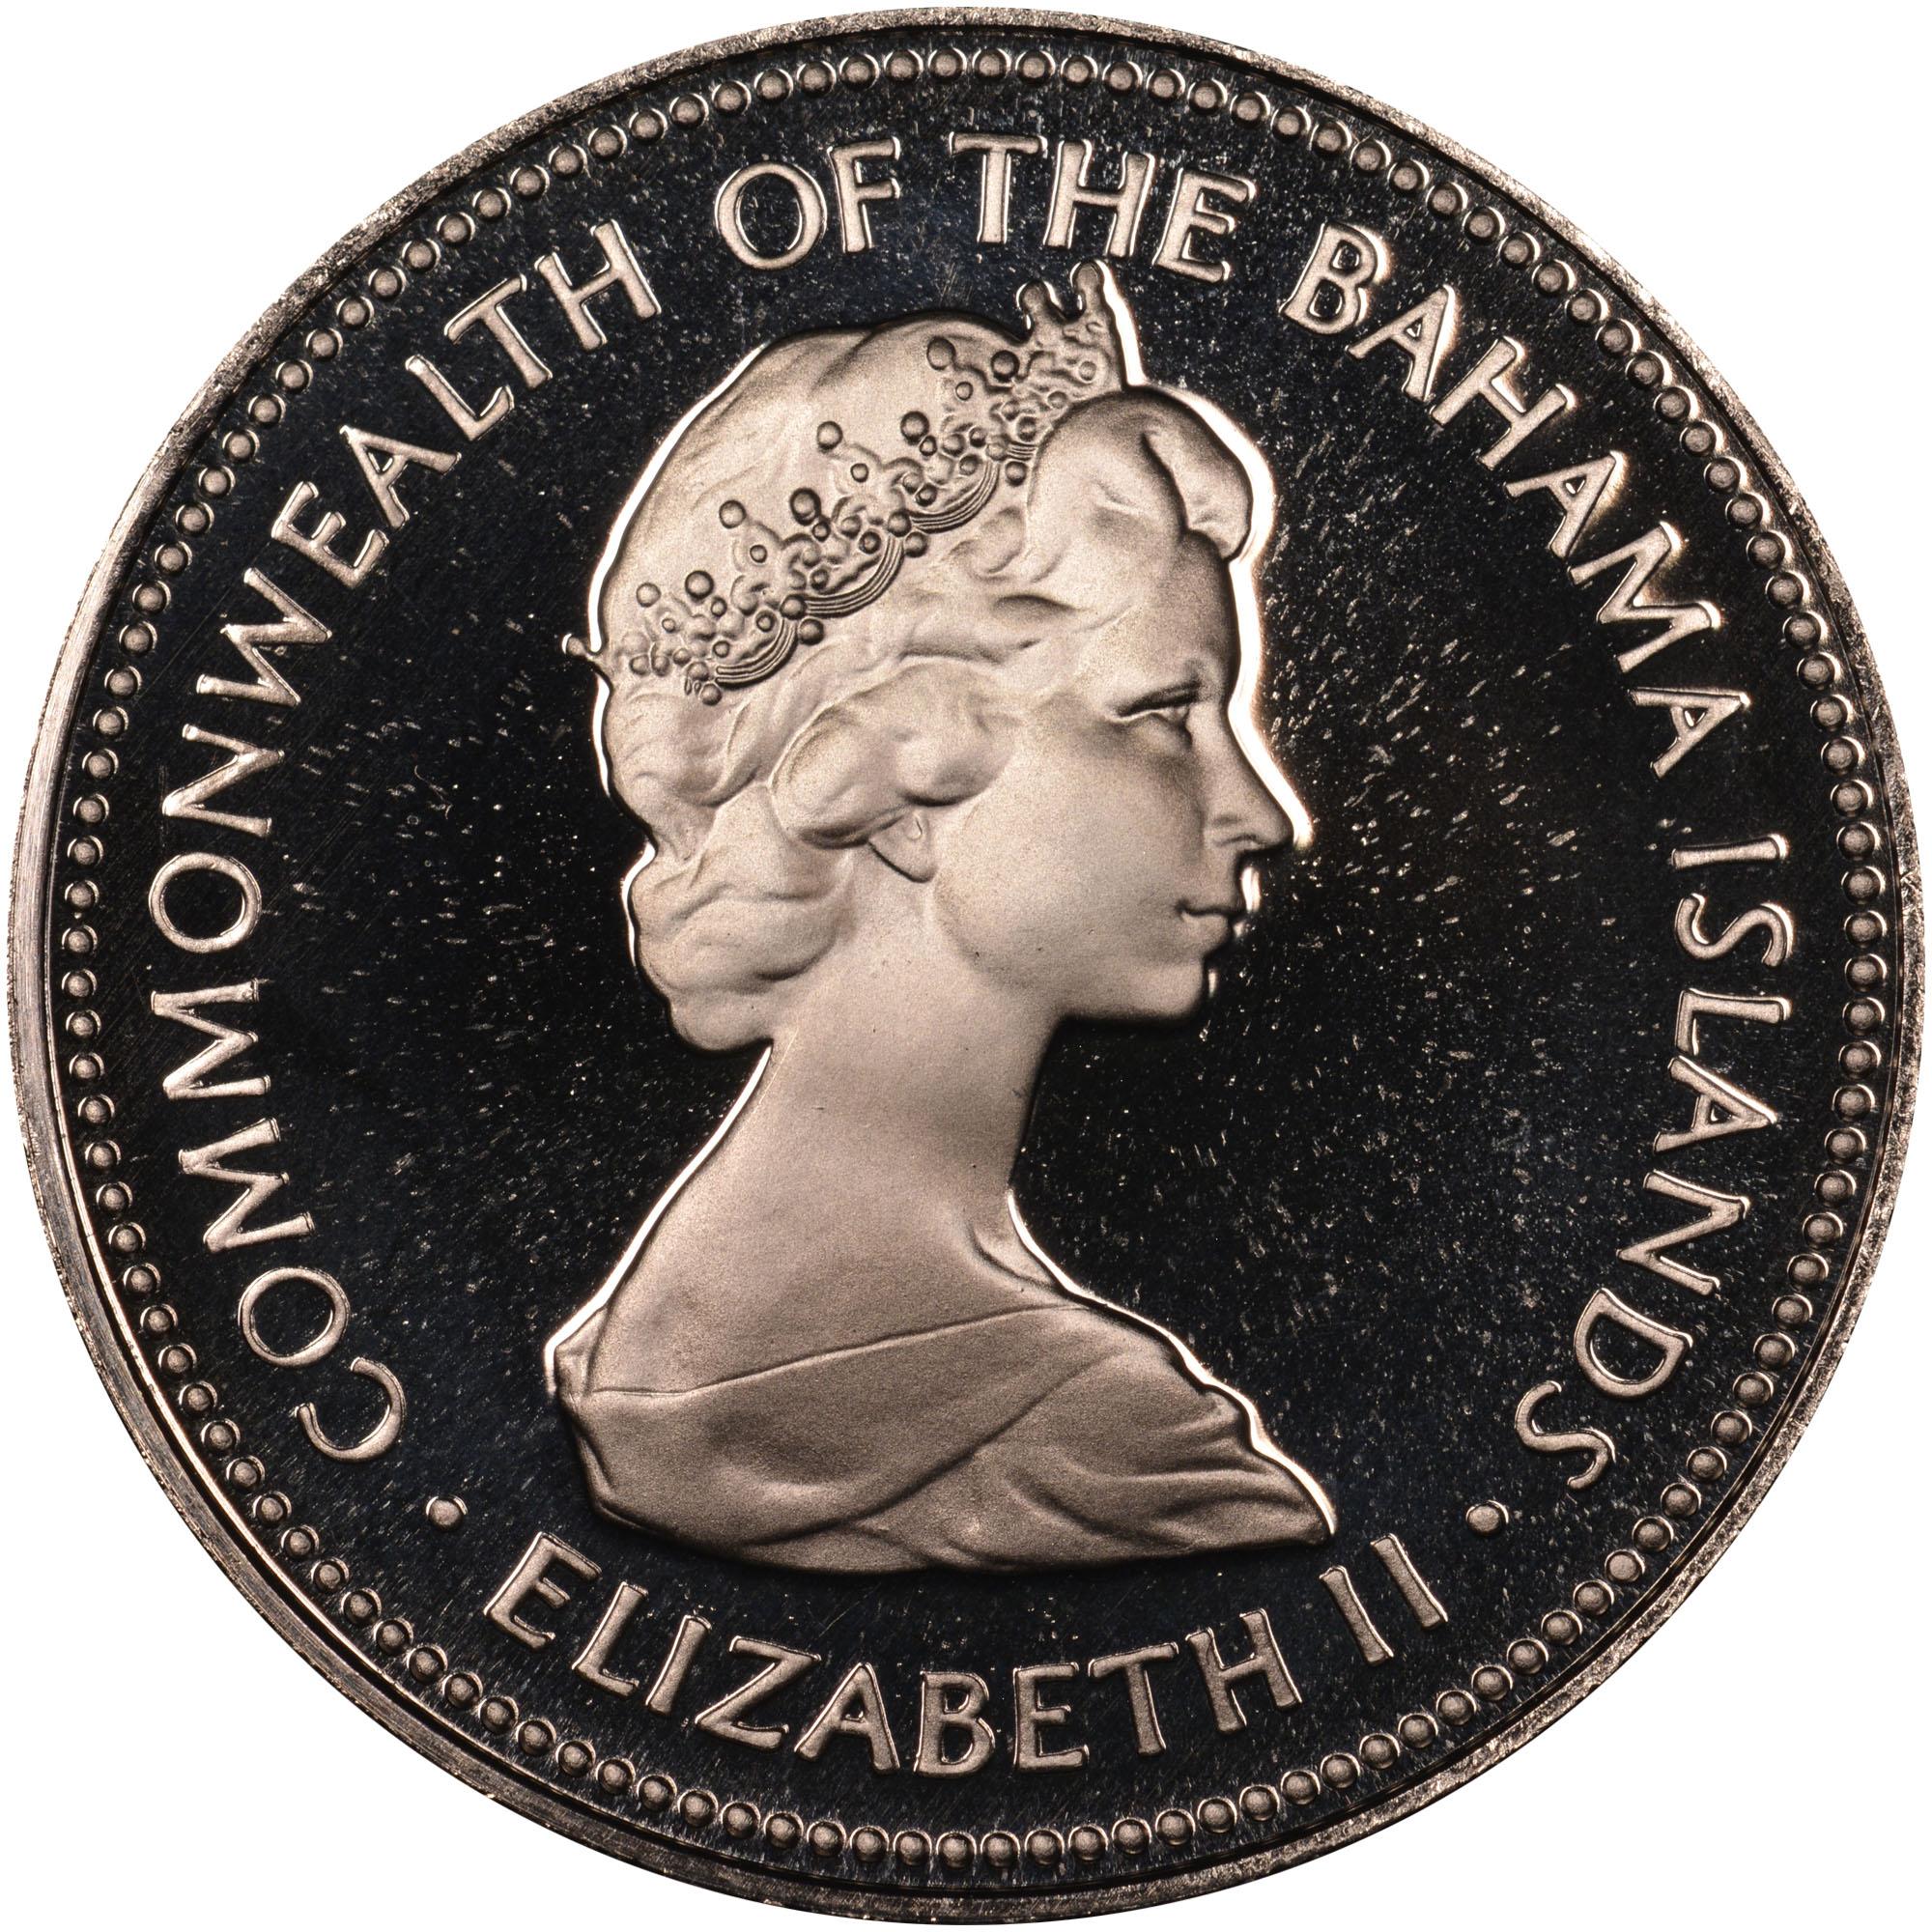 1971-1973 Bahamas 25 Cents obverse